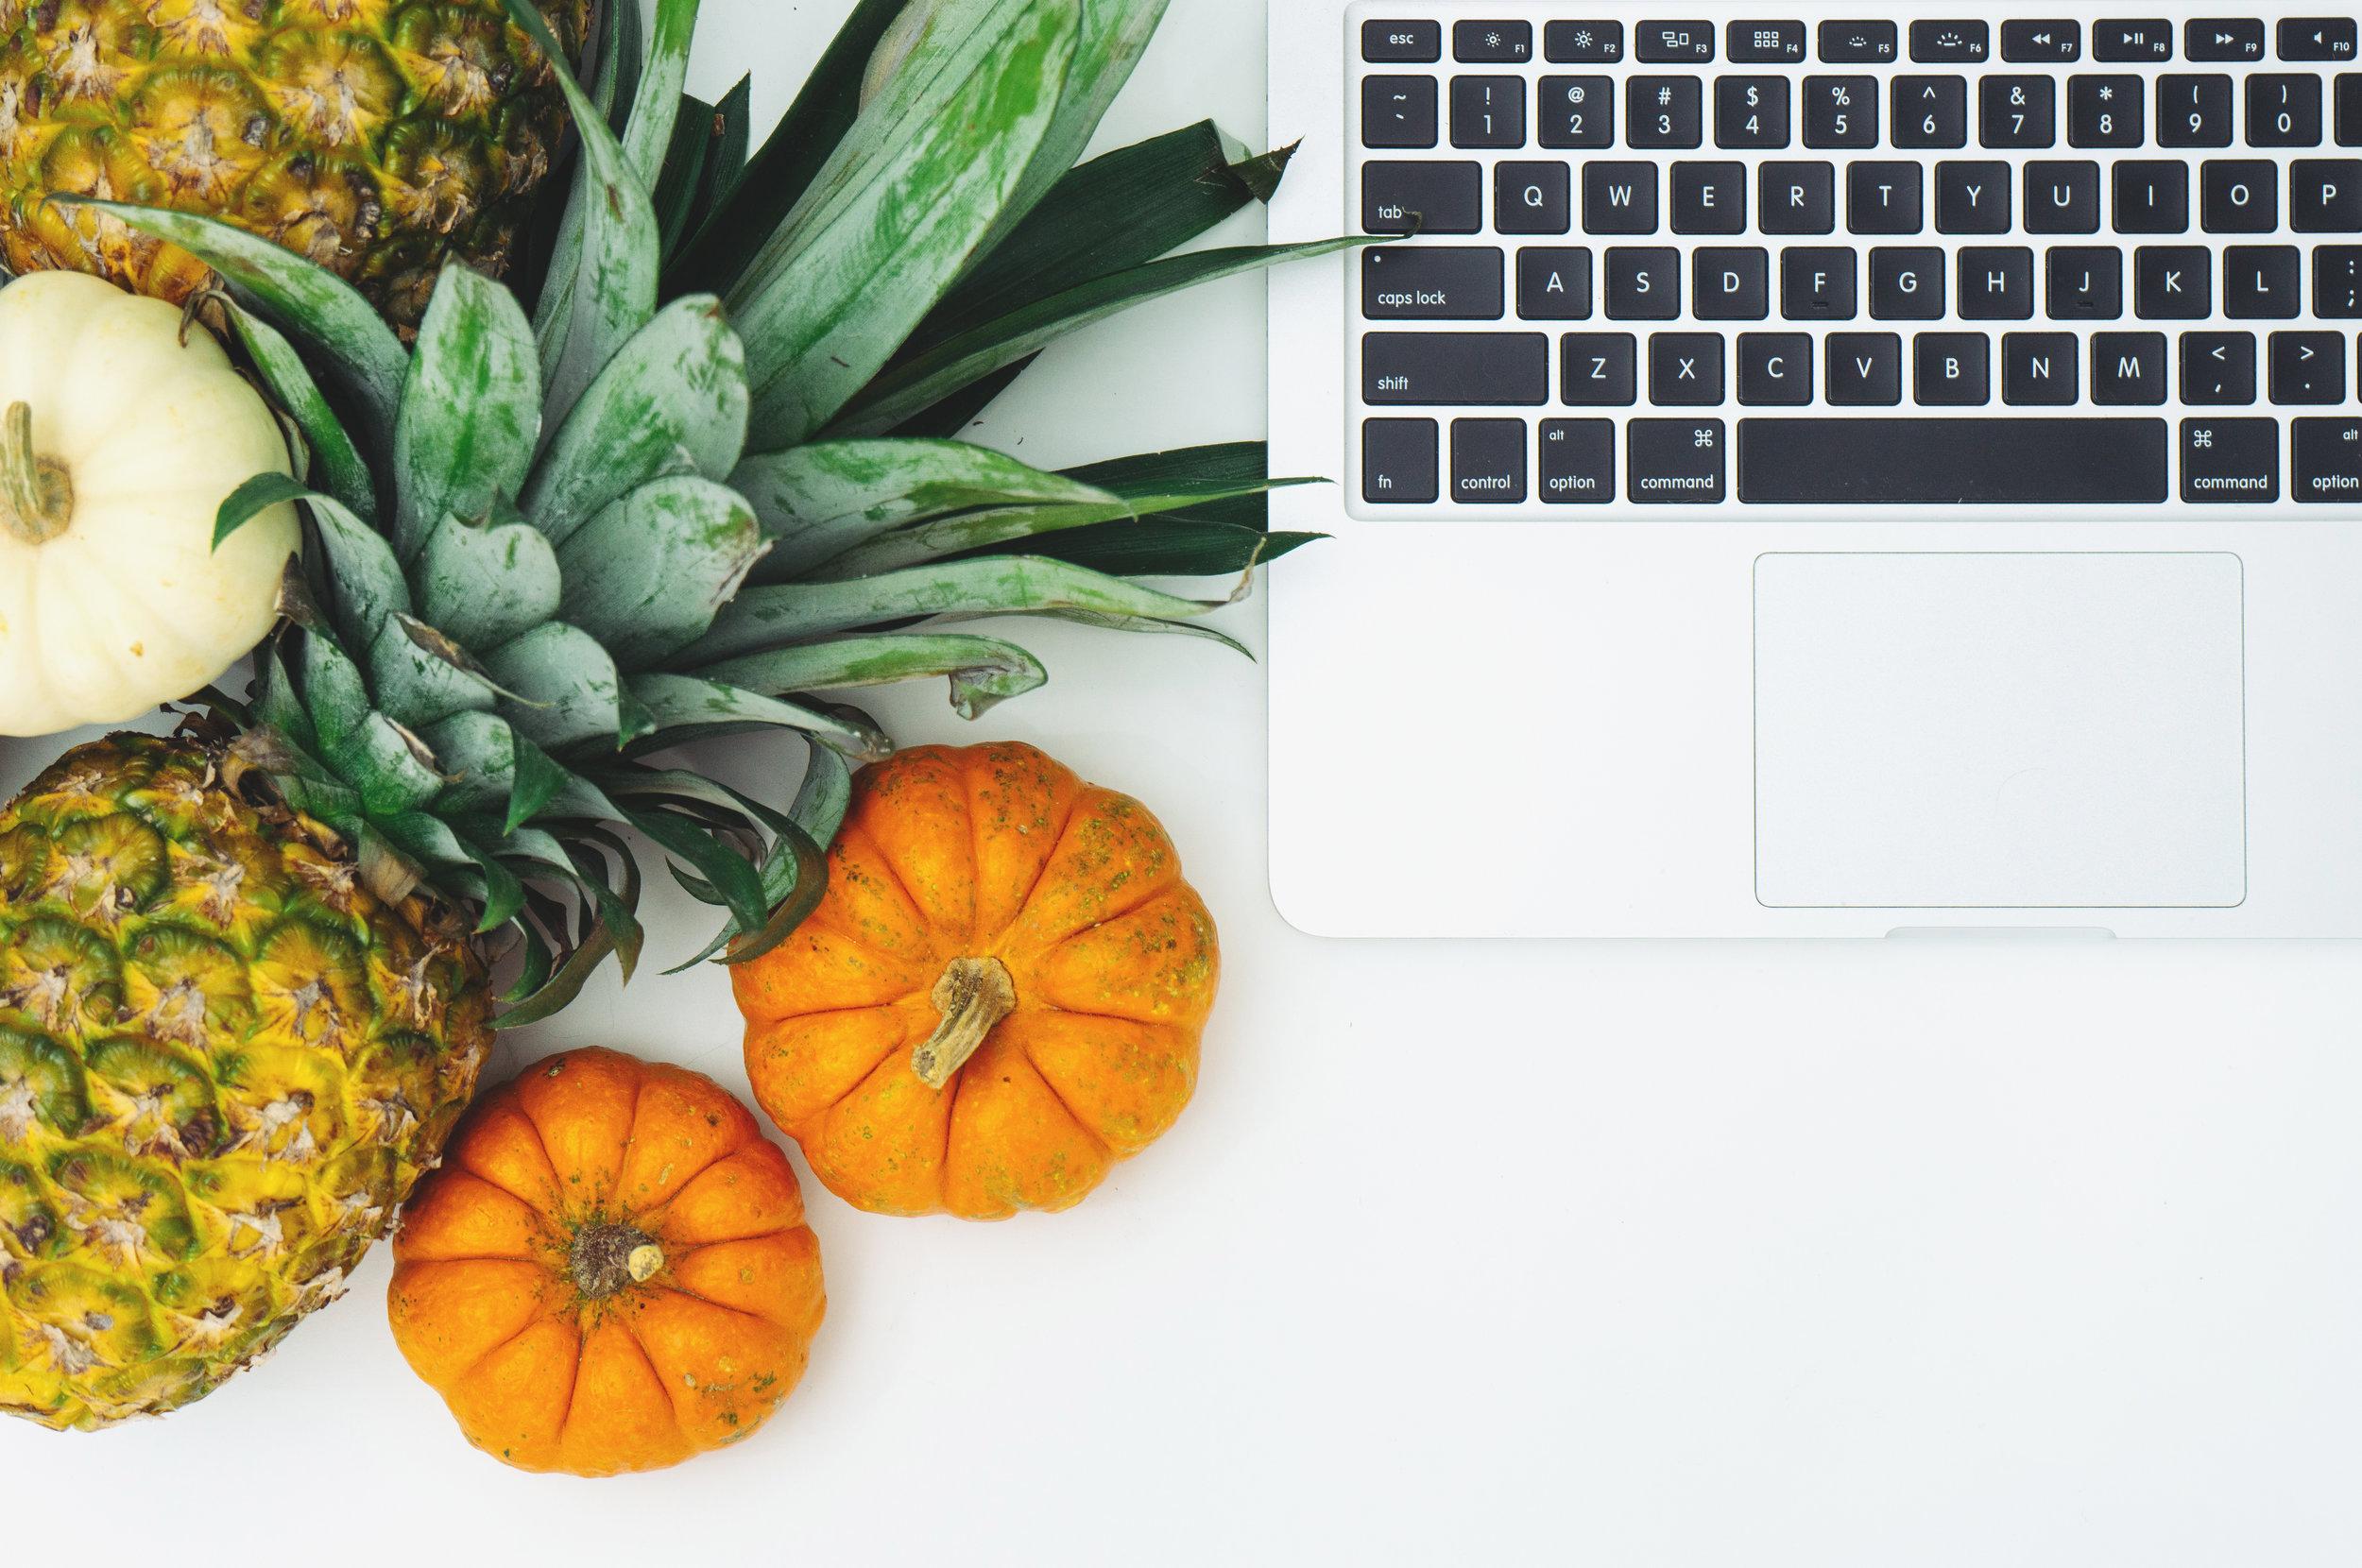 sprout 2018 - participate